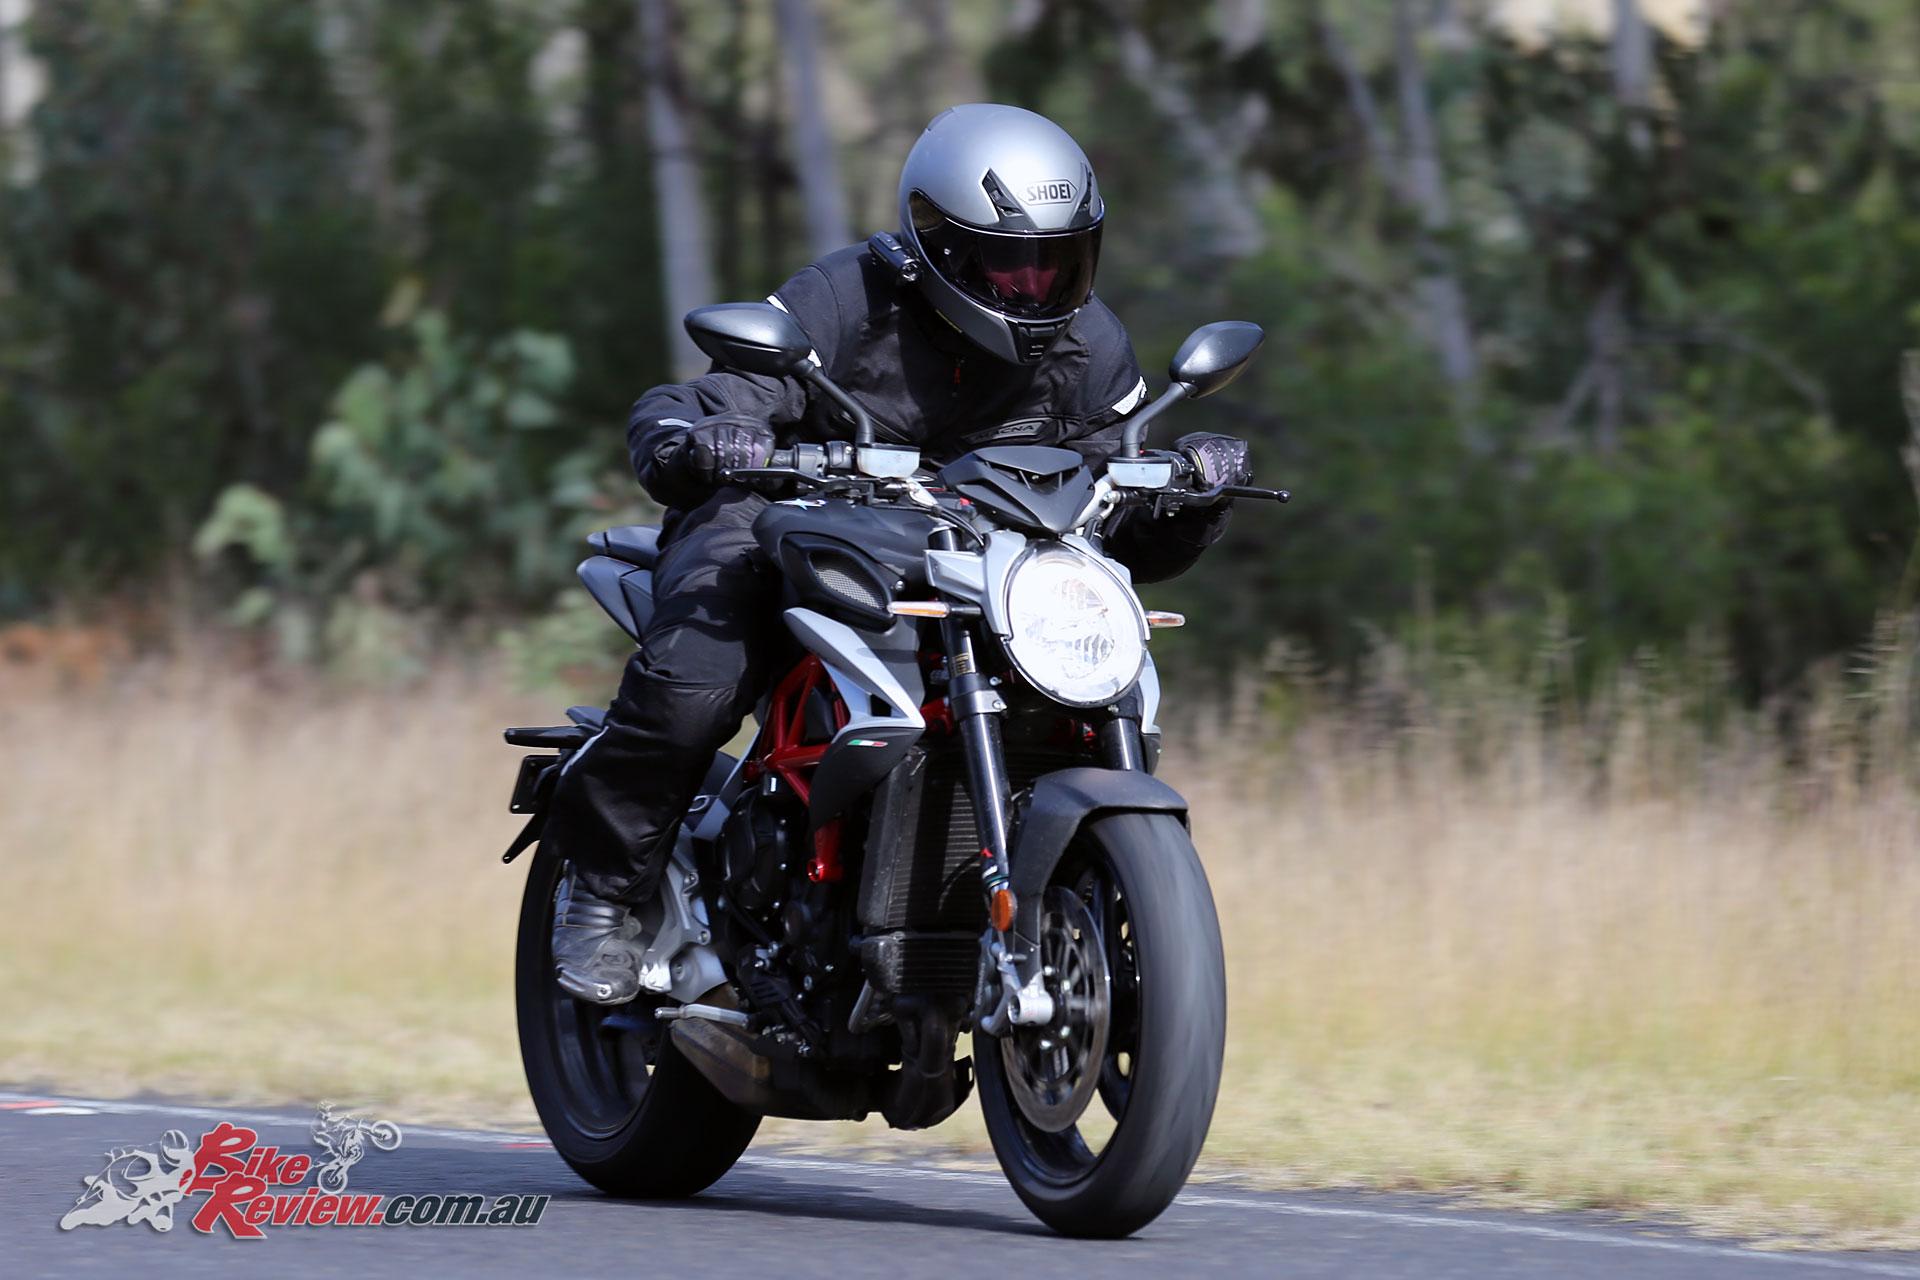 Wallpaper Mv Agusta Brutale 800 2017 Automotive Bikes: Review: 2017 MV Agusta Brutale 800